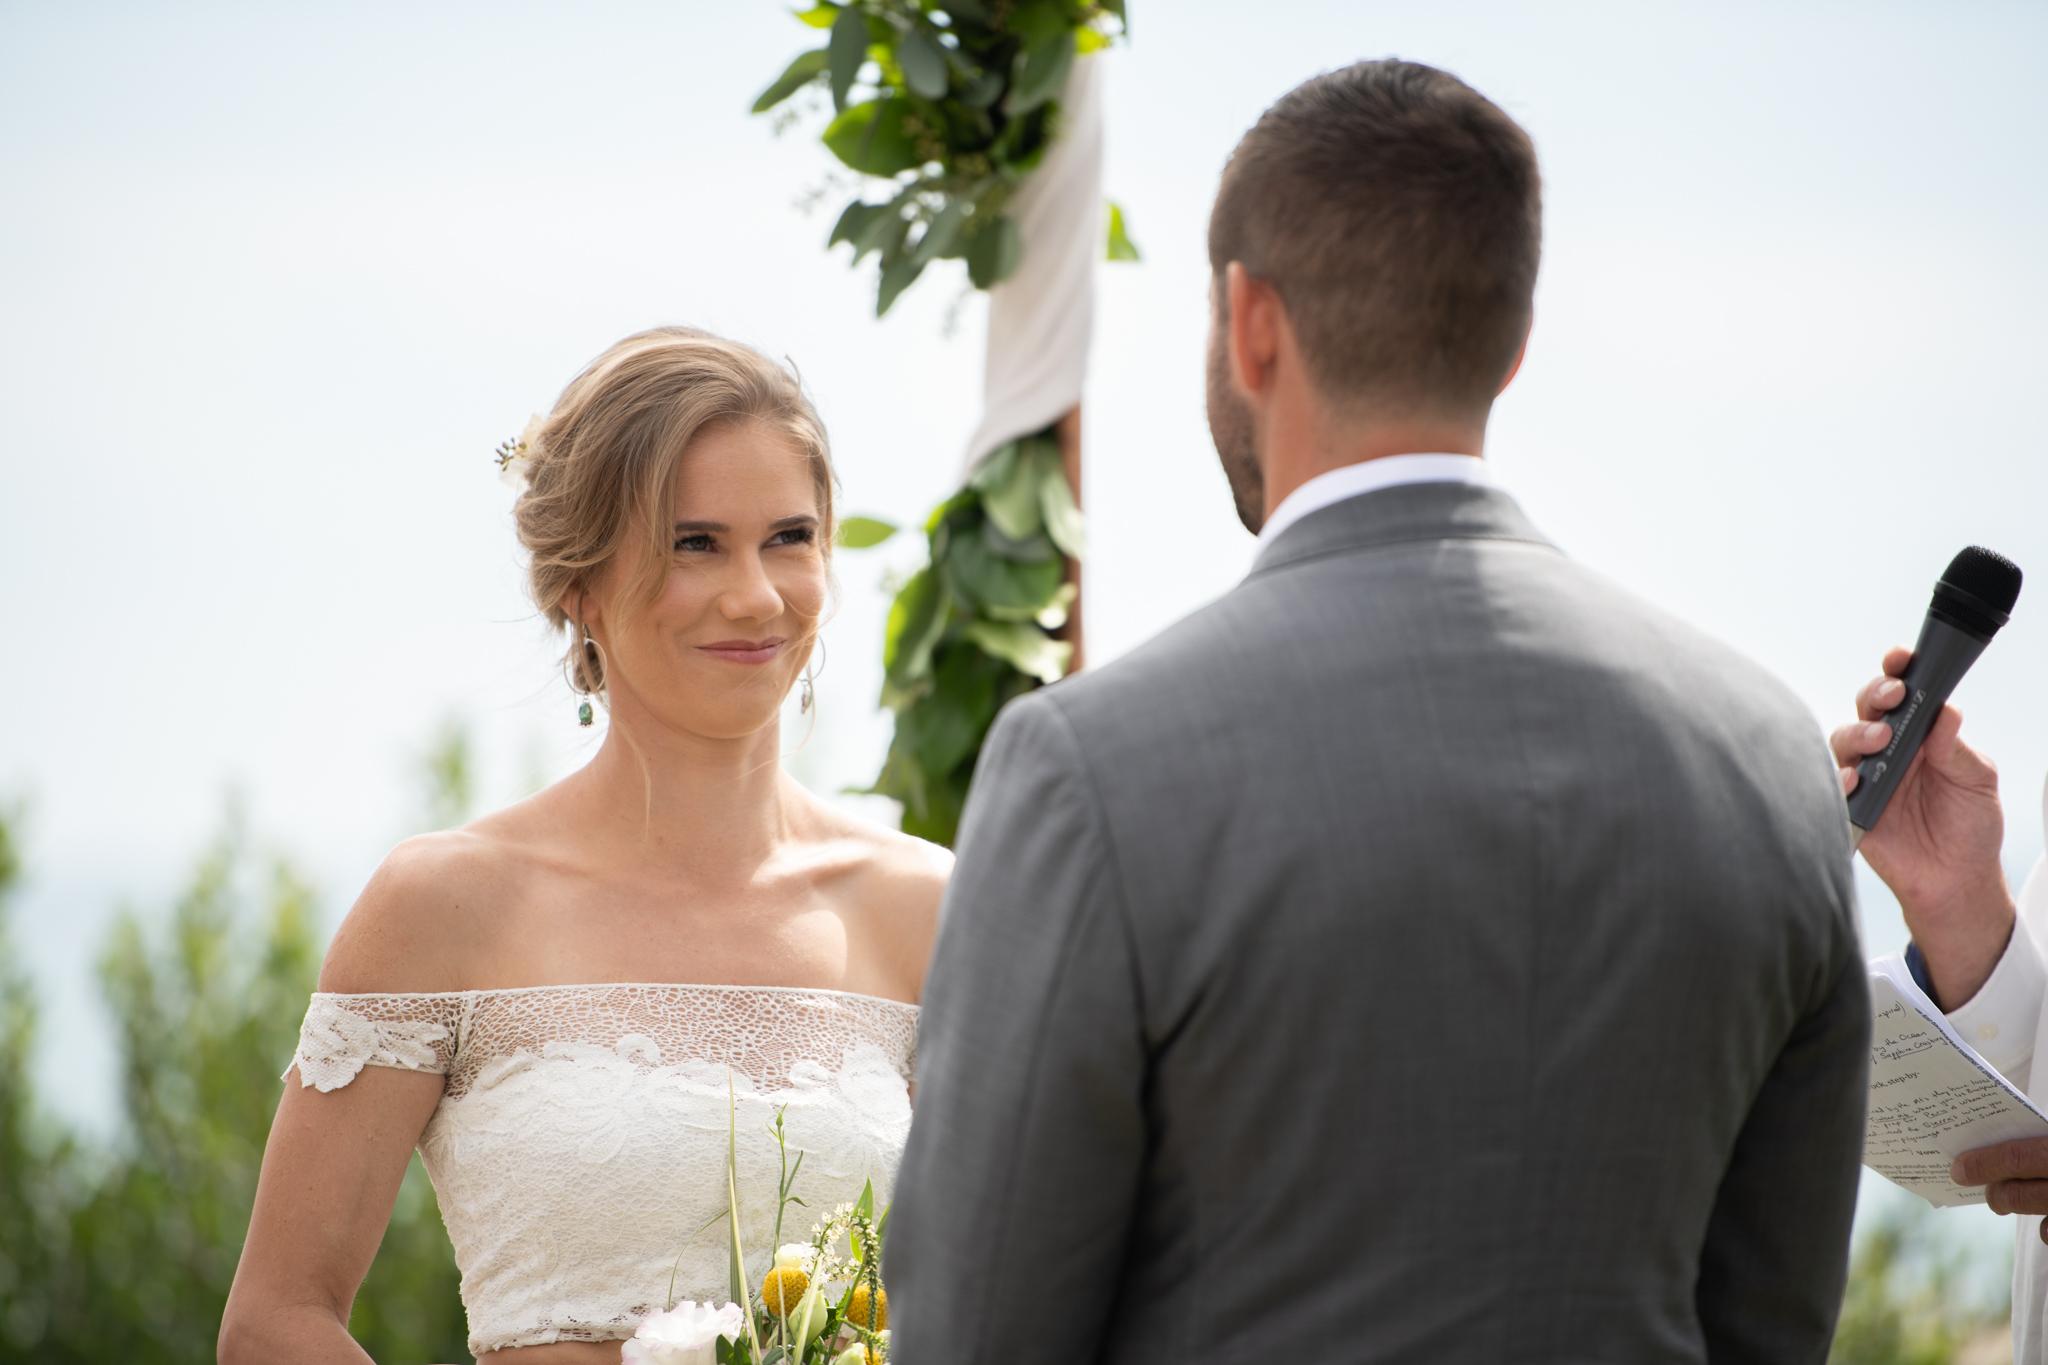 25_PRVW_Jenny_Ken_Wedding_Trevor_Hooper_Photo.jpg